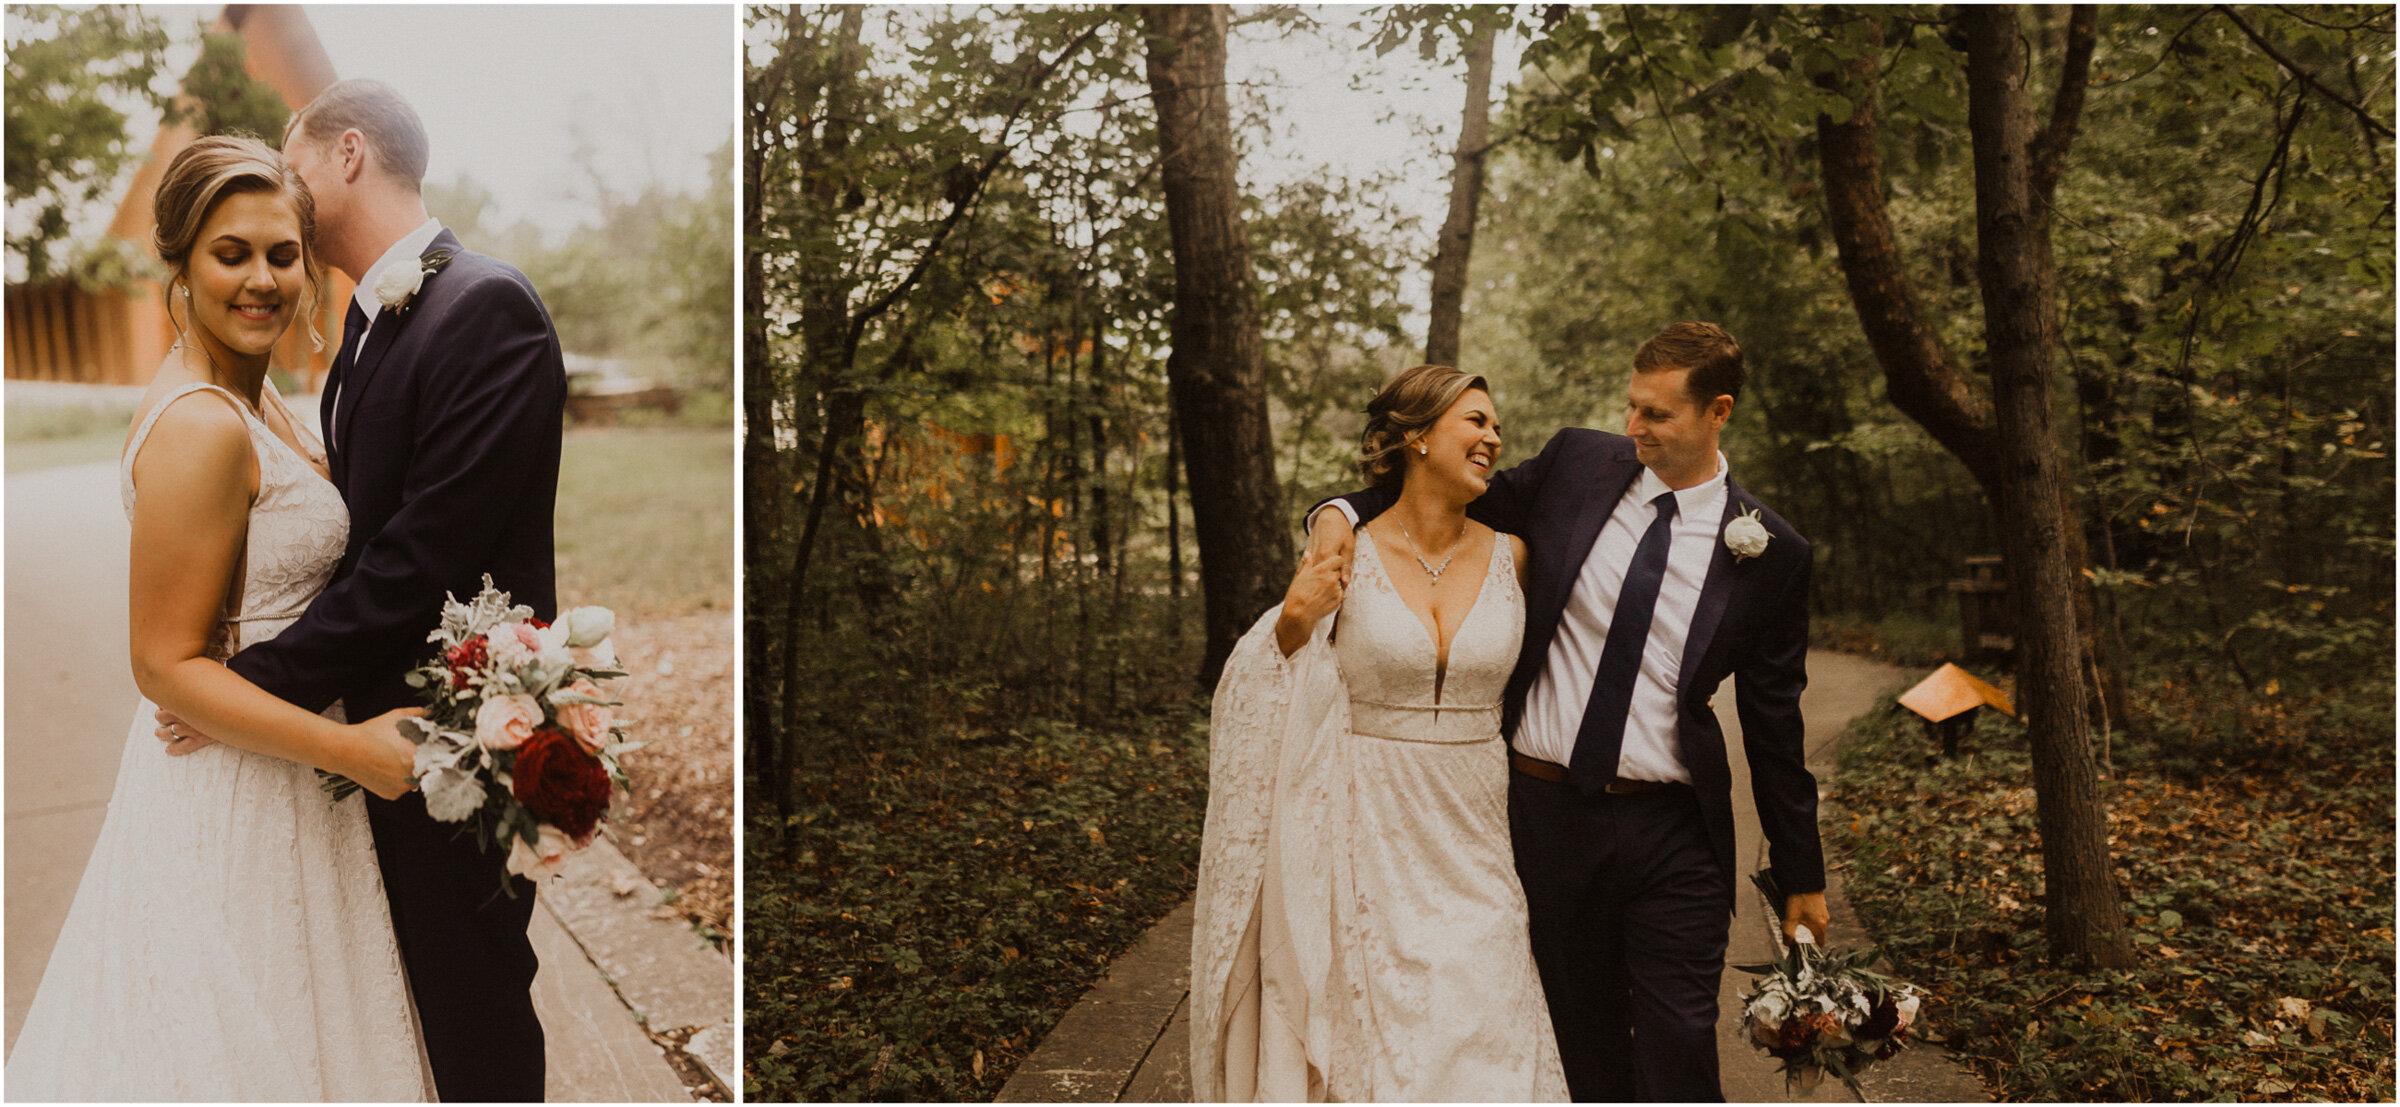 alyssa barletter photography summer wedding photographer powell gardens-29.jpg